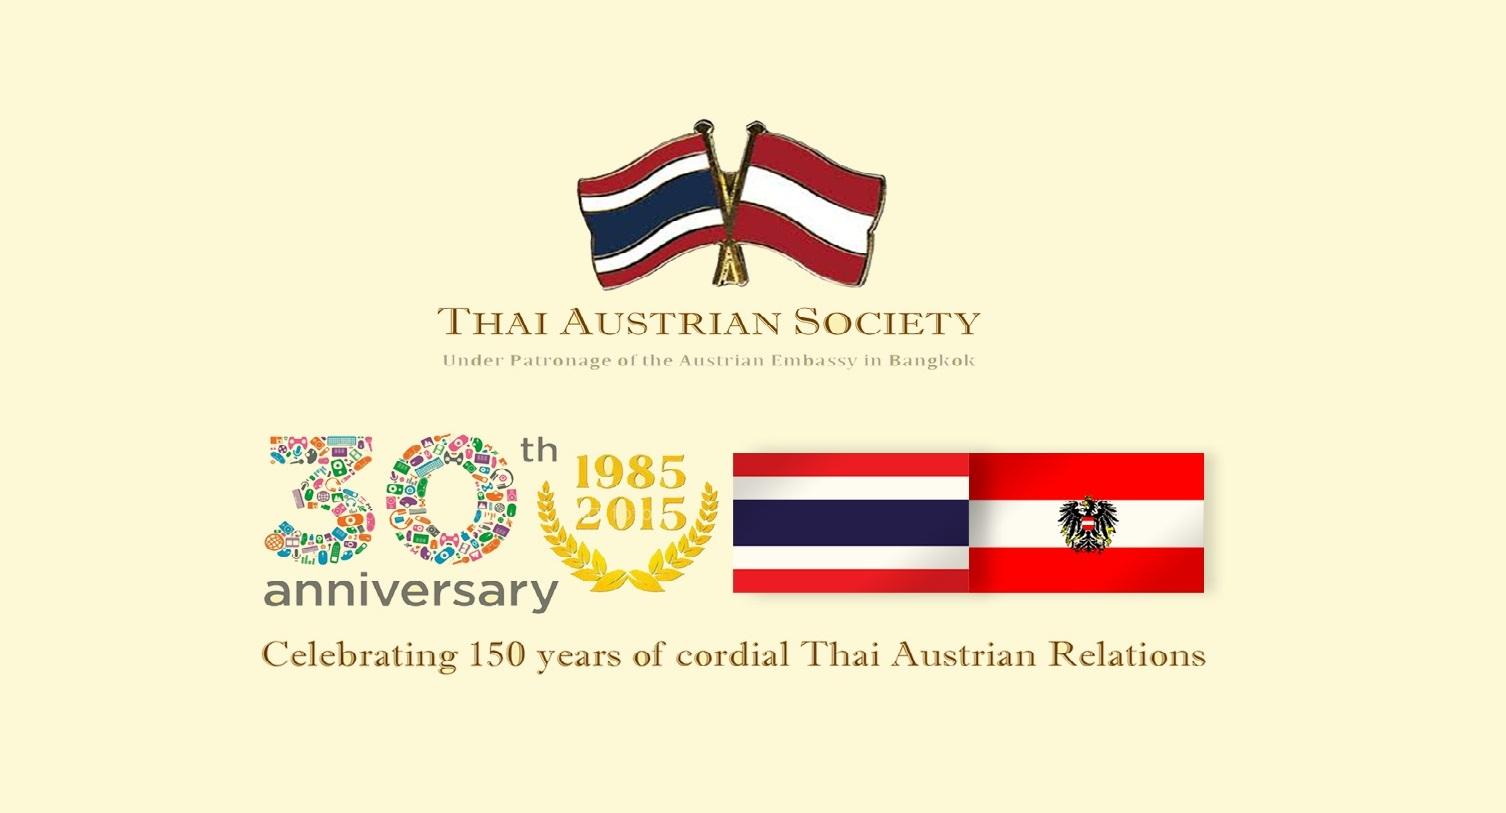 Thai Austrian Society